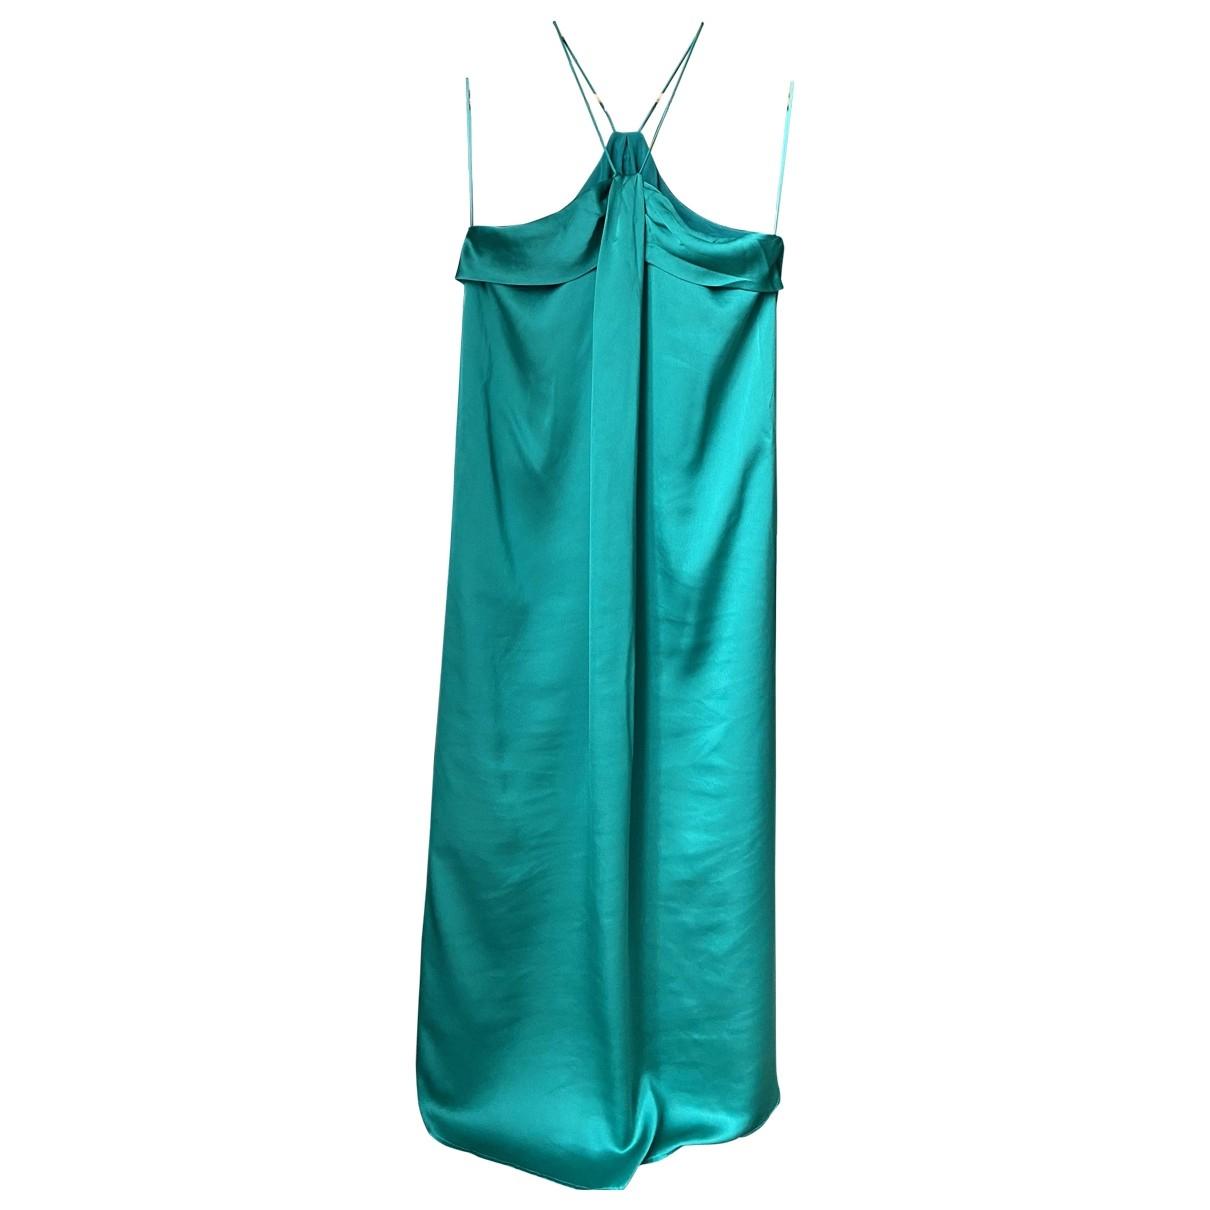 Mango \N Kleid in  Gruen Polyester